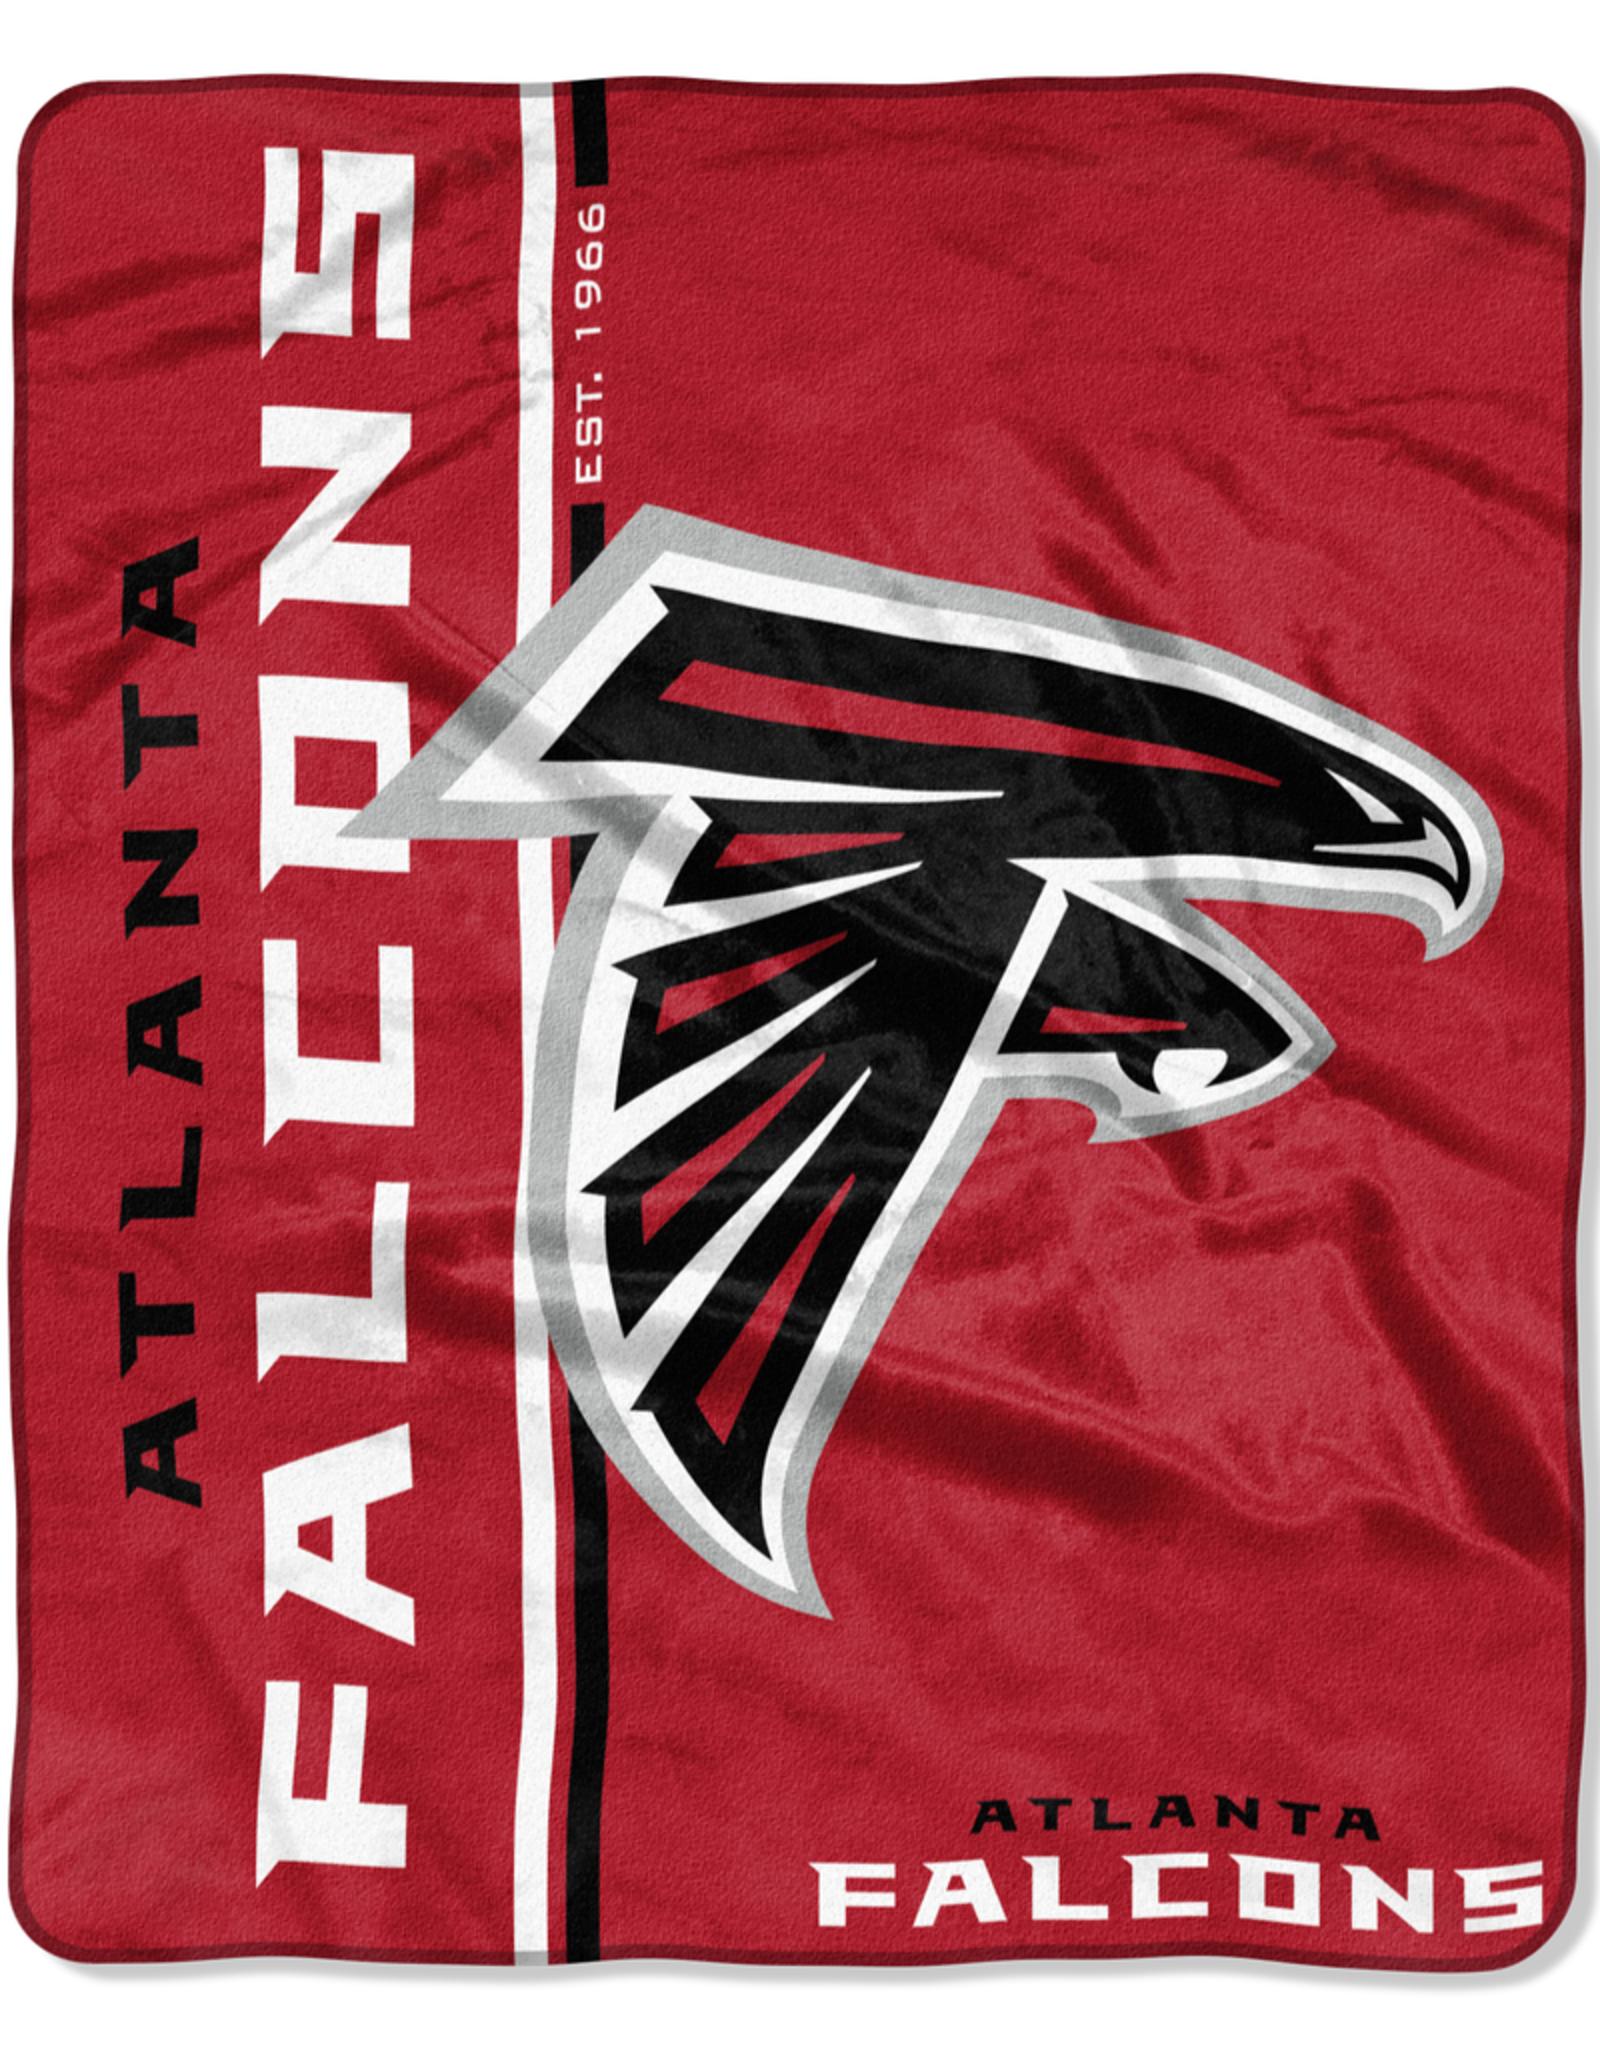 NORTHWEST Atlanta Falcons Restructure Royal Plush Raschel Throw